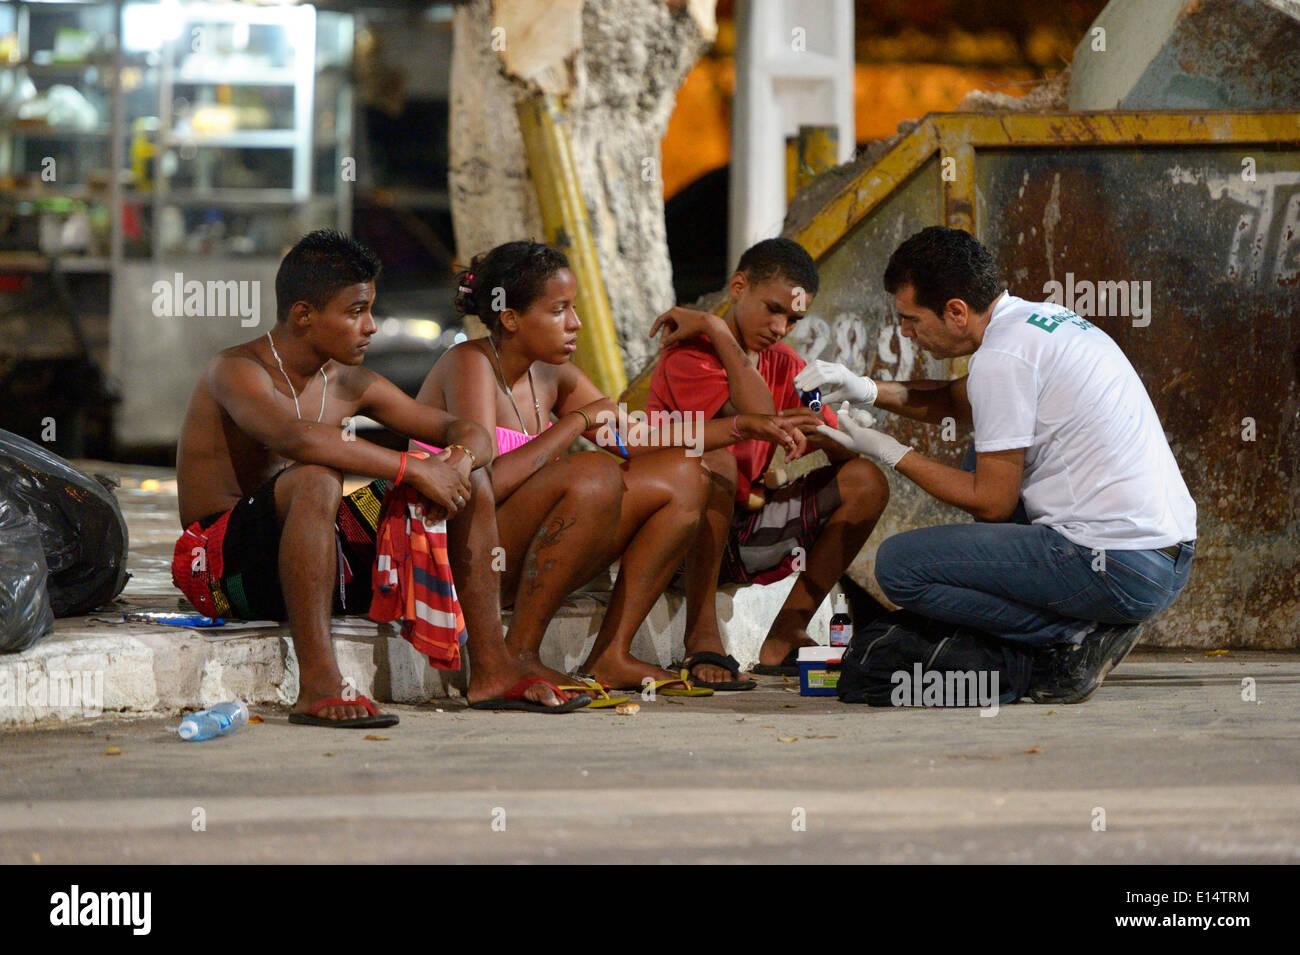 Social worker supporting street children, Fortaleza, Ceará, Brazil - Stock Image